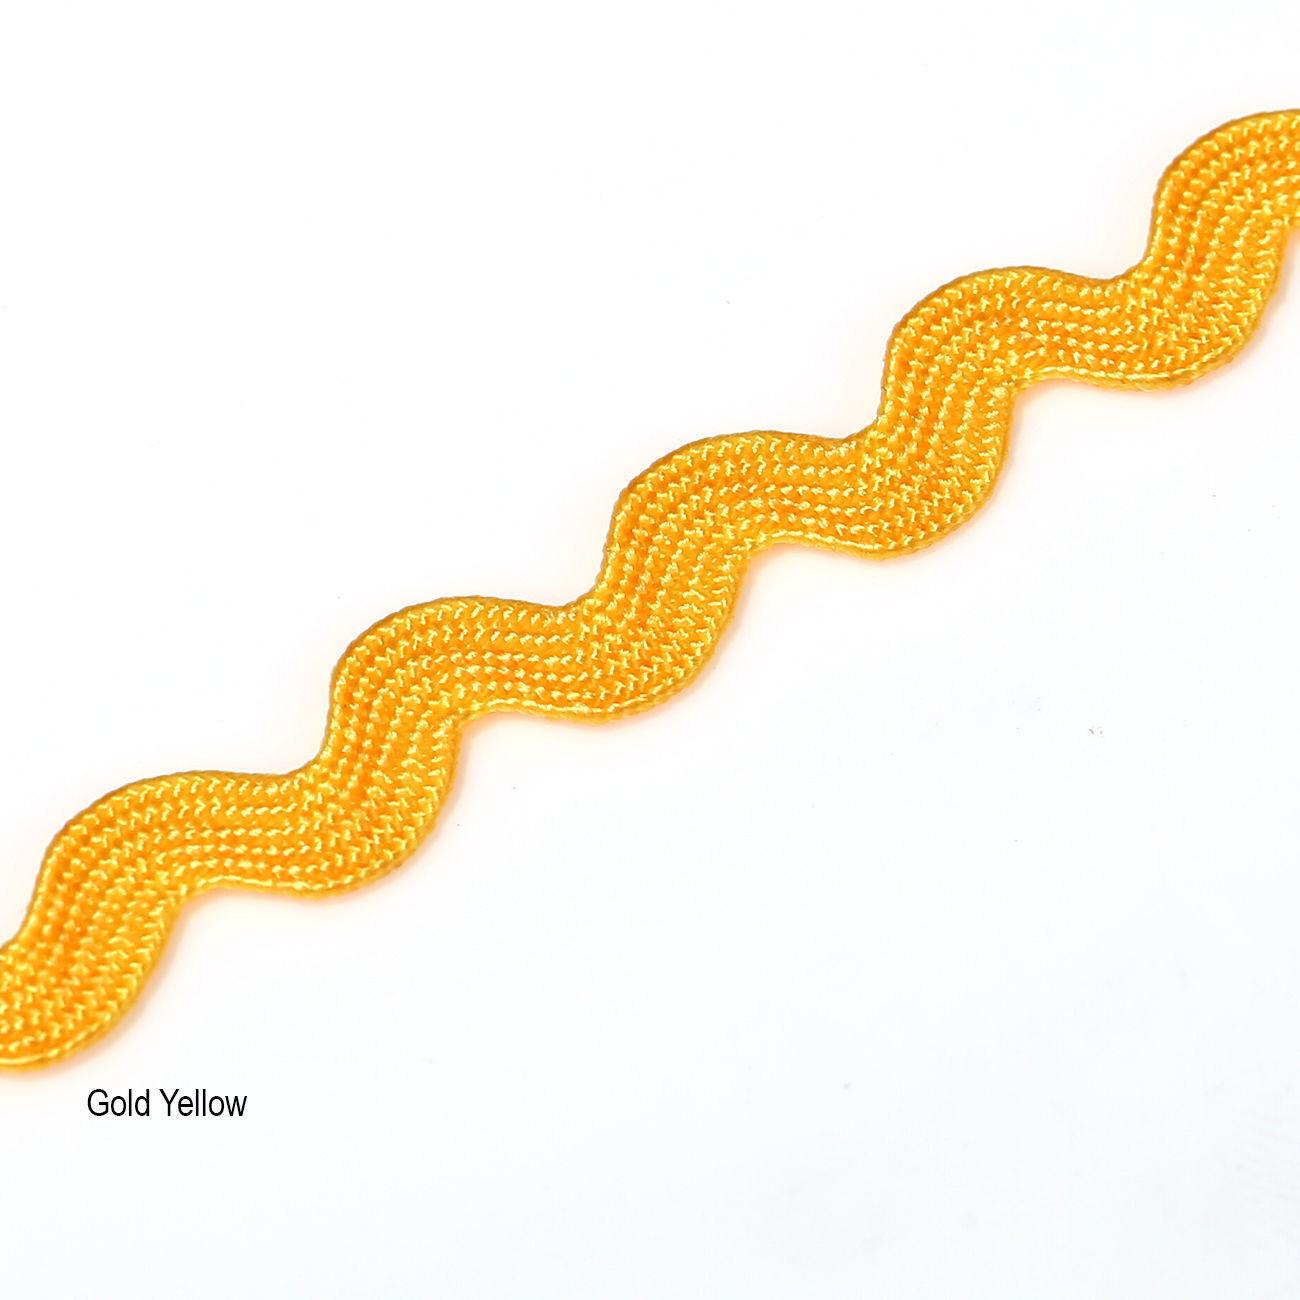 6mm Rik Rak Ric Rac S Bend Zig Zag Trim Ribbon Trimming Braid,15Yards,Neotrims